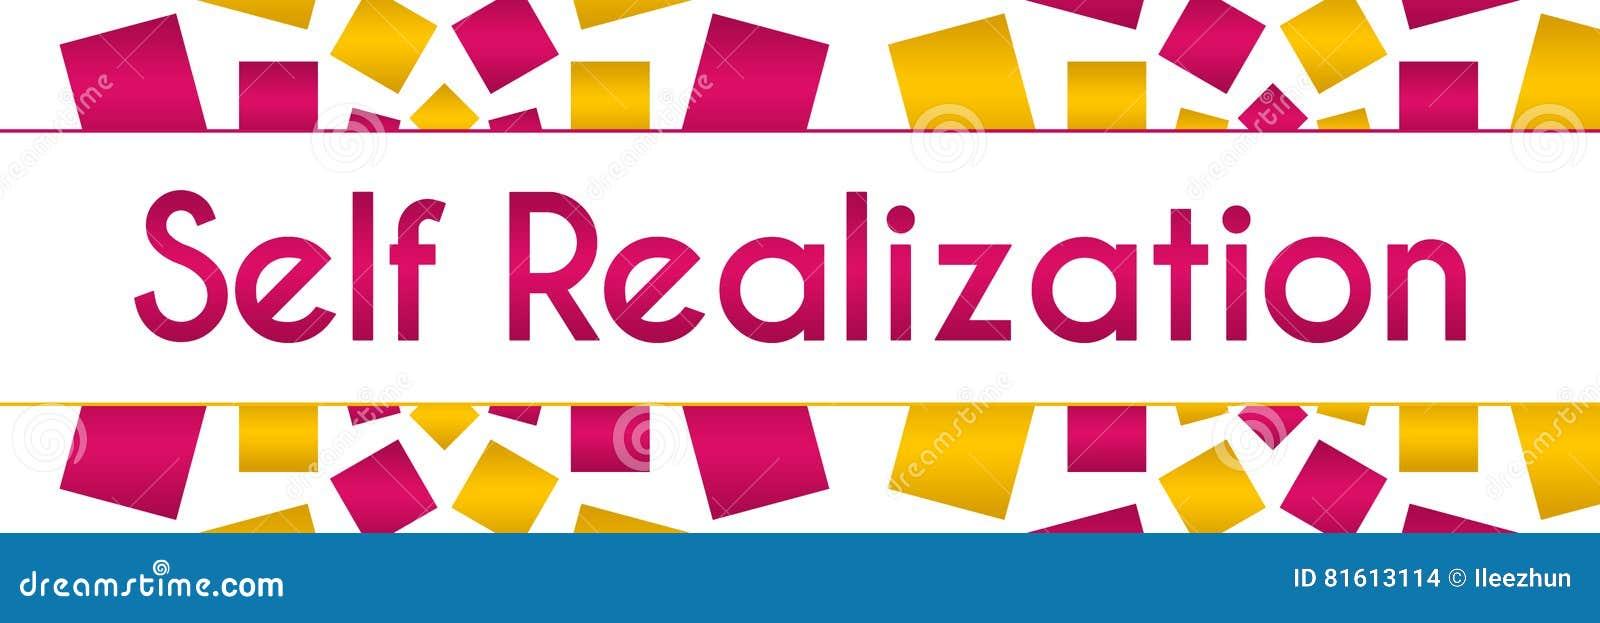 Self Realization Pink Golden Texture Horizontal Stock